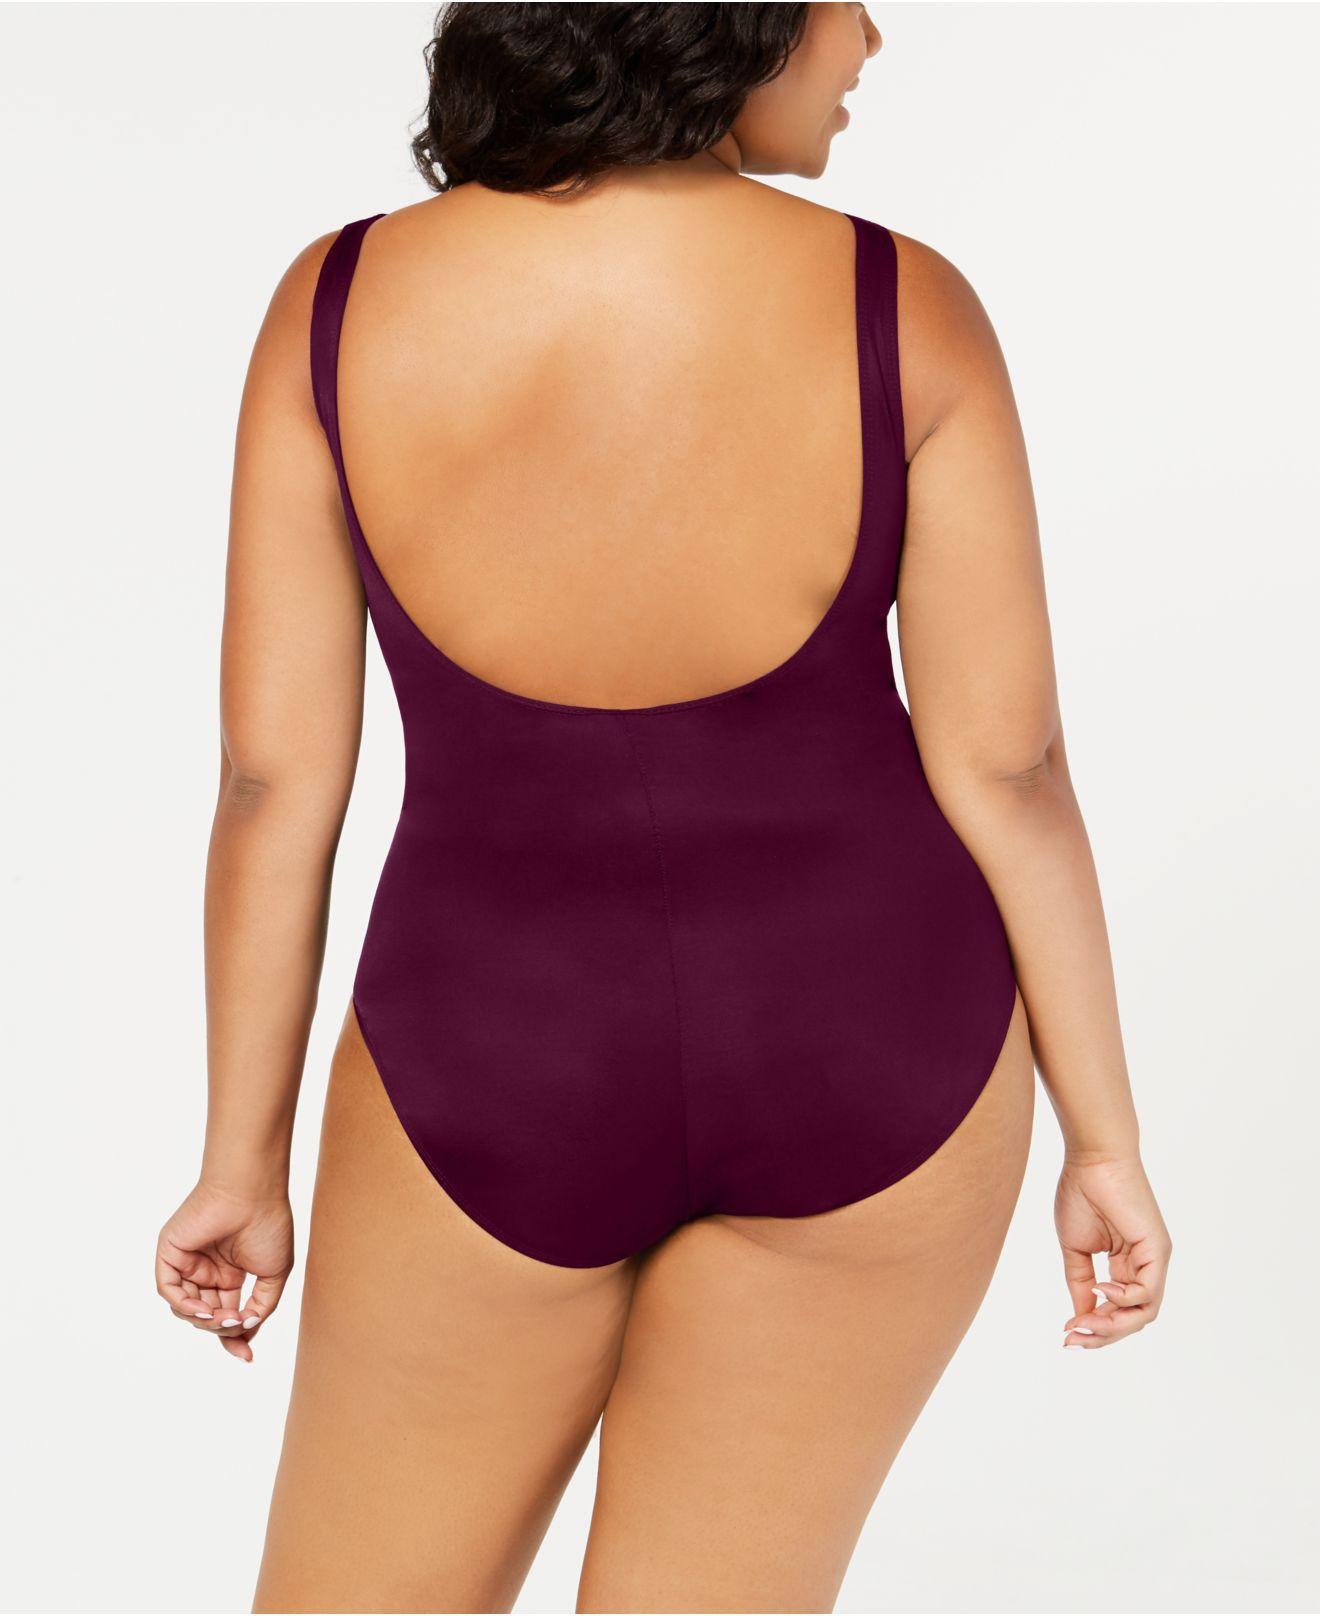 f3f6b58ffe8 Lyst - Miraclesuit Plus Size Escape Underwire Wrap One-piece Swimsuit in  Purple